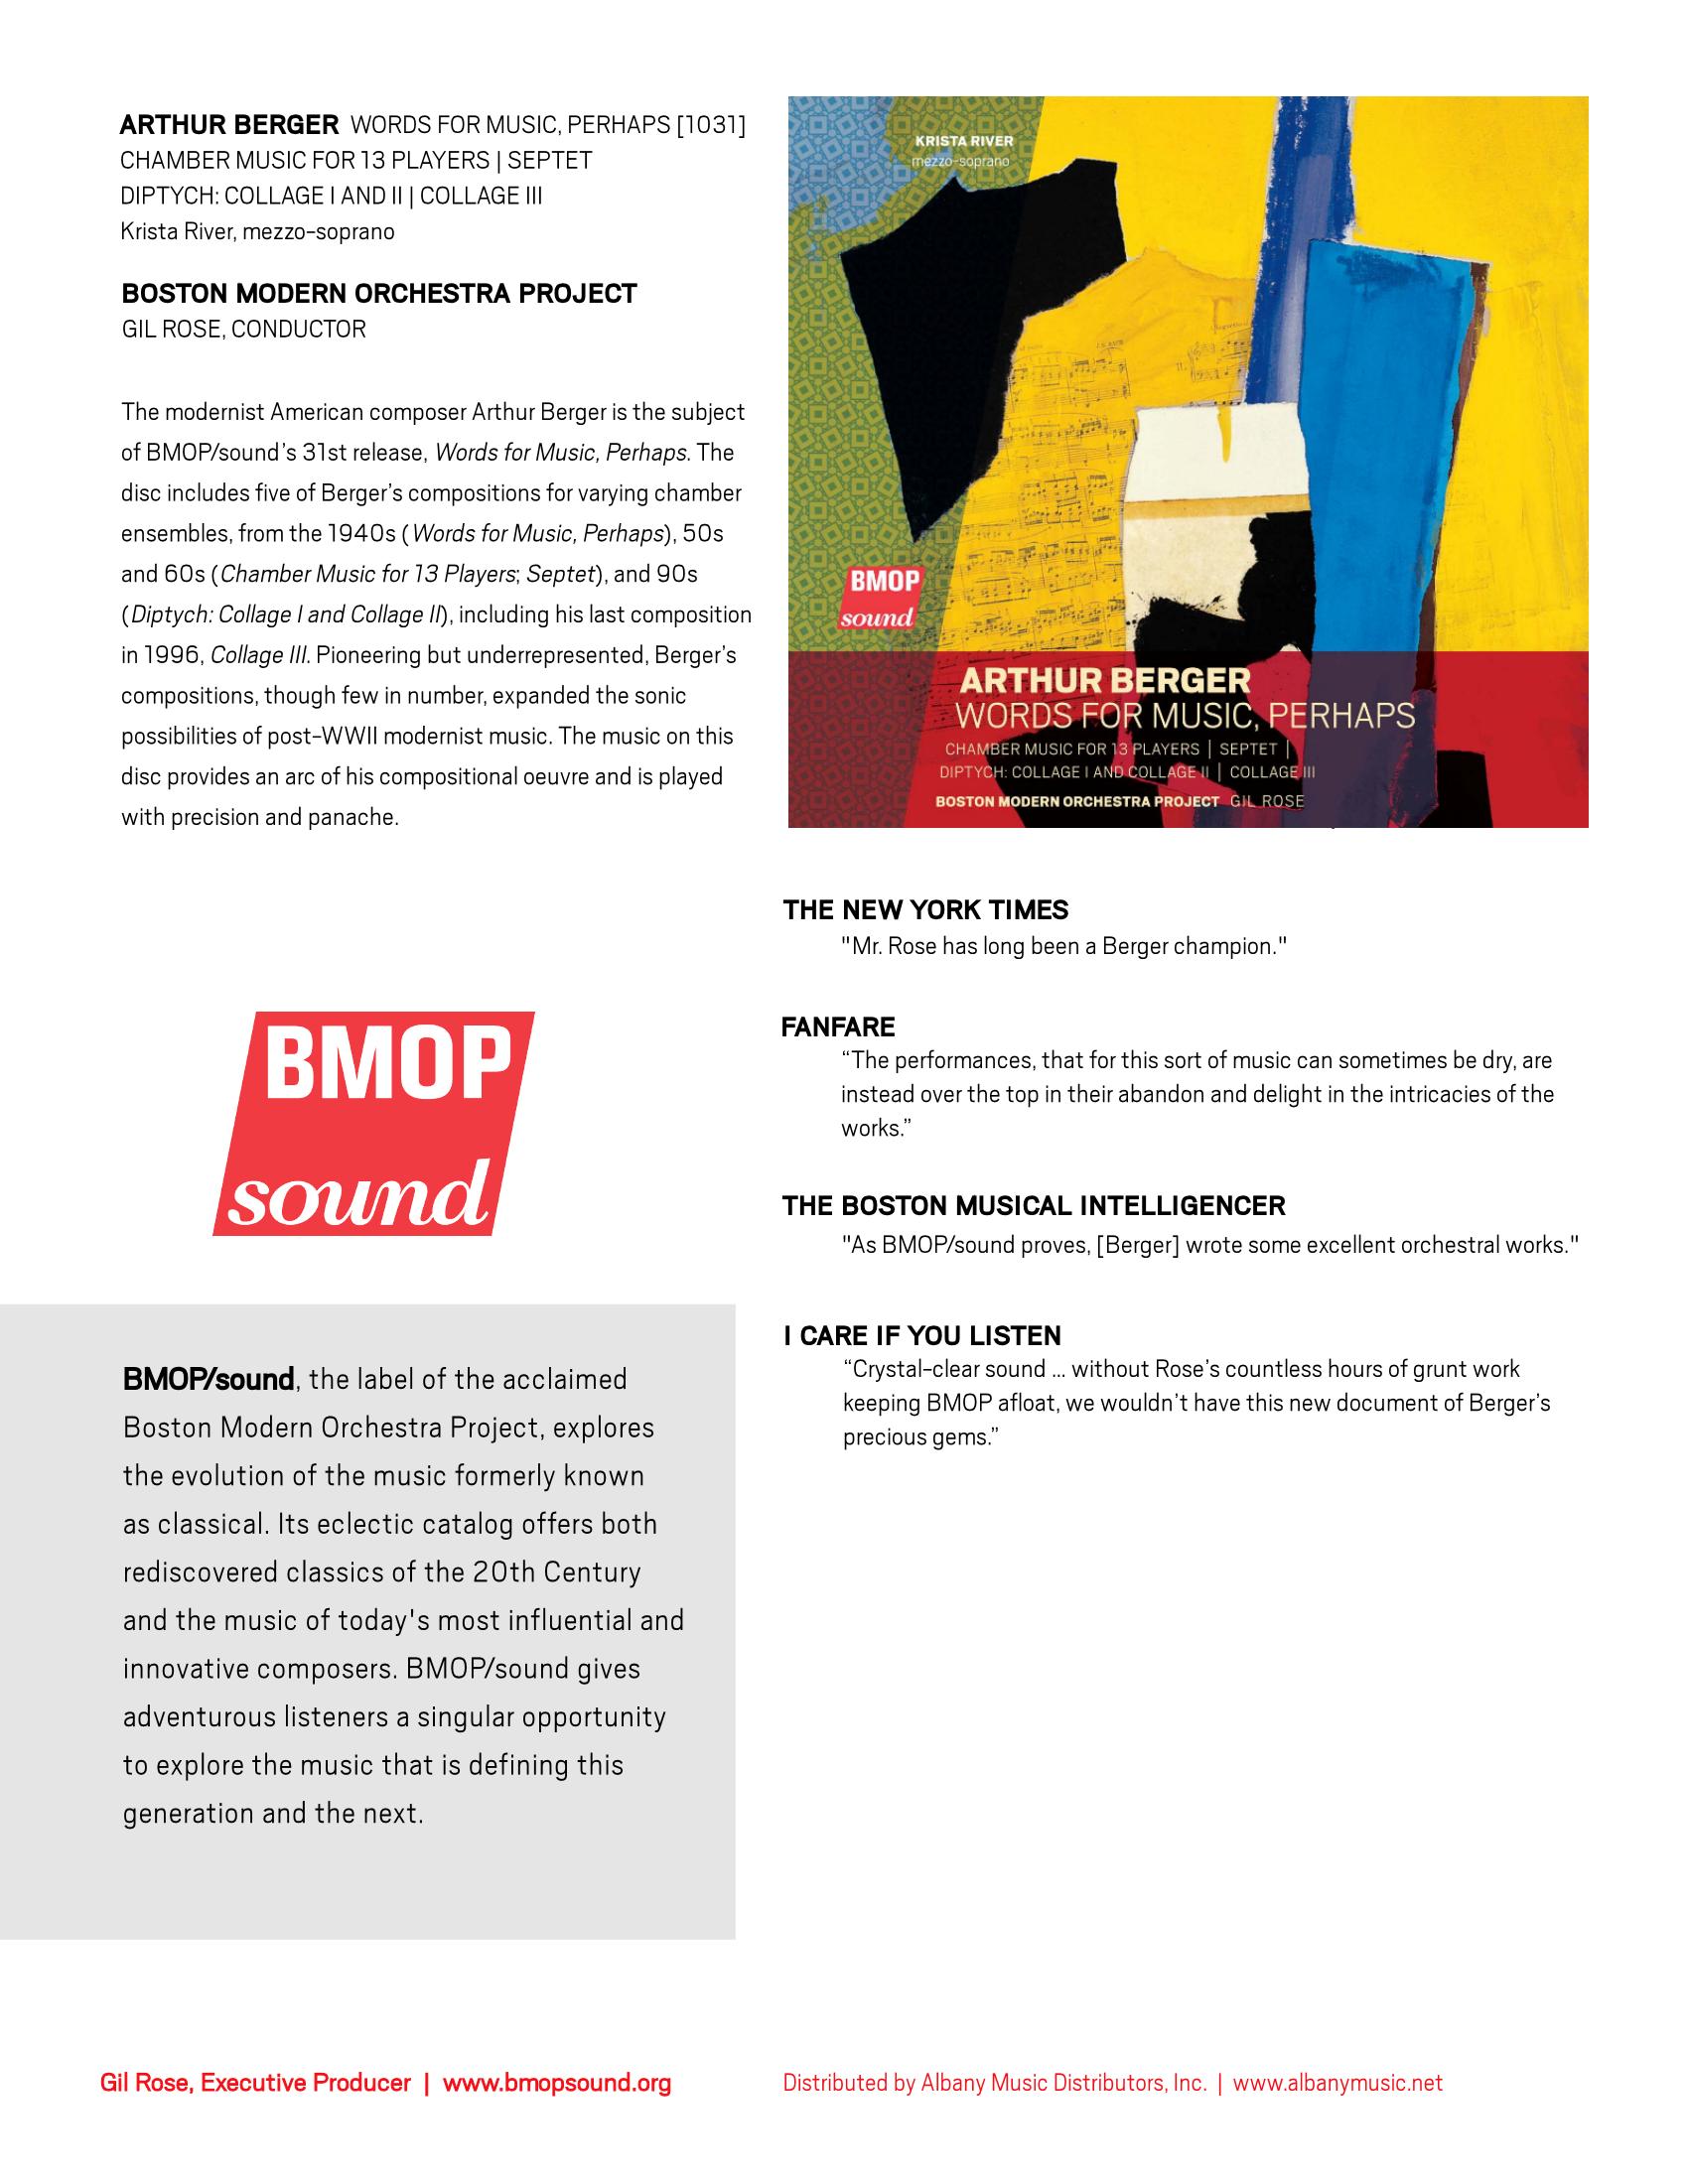 Berger - BMOPsound 1031 one-sheet.png